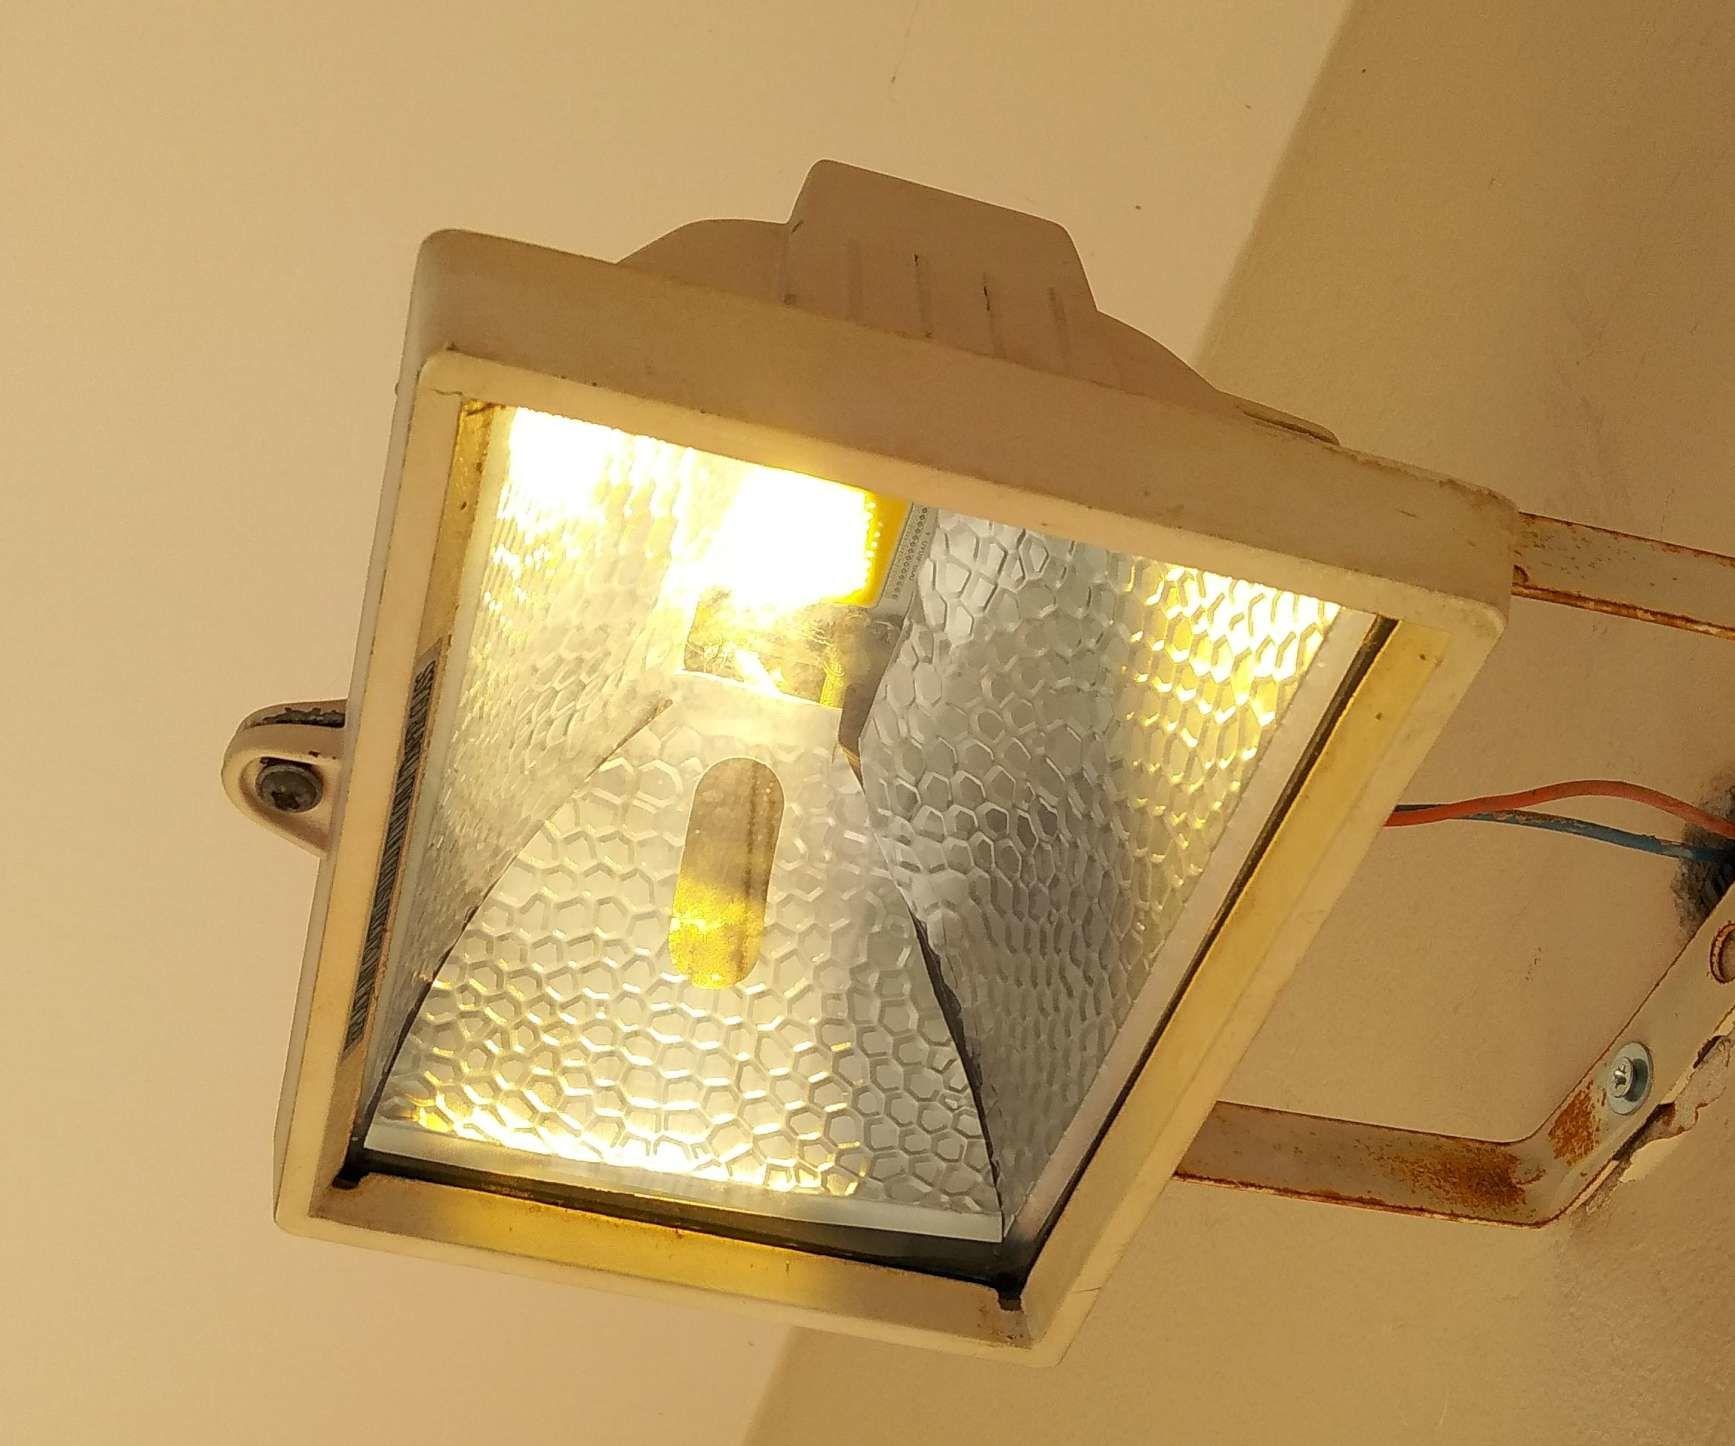 Retrofit a Incandescent 500W to 50W LED Flood Light